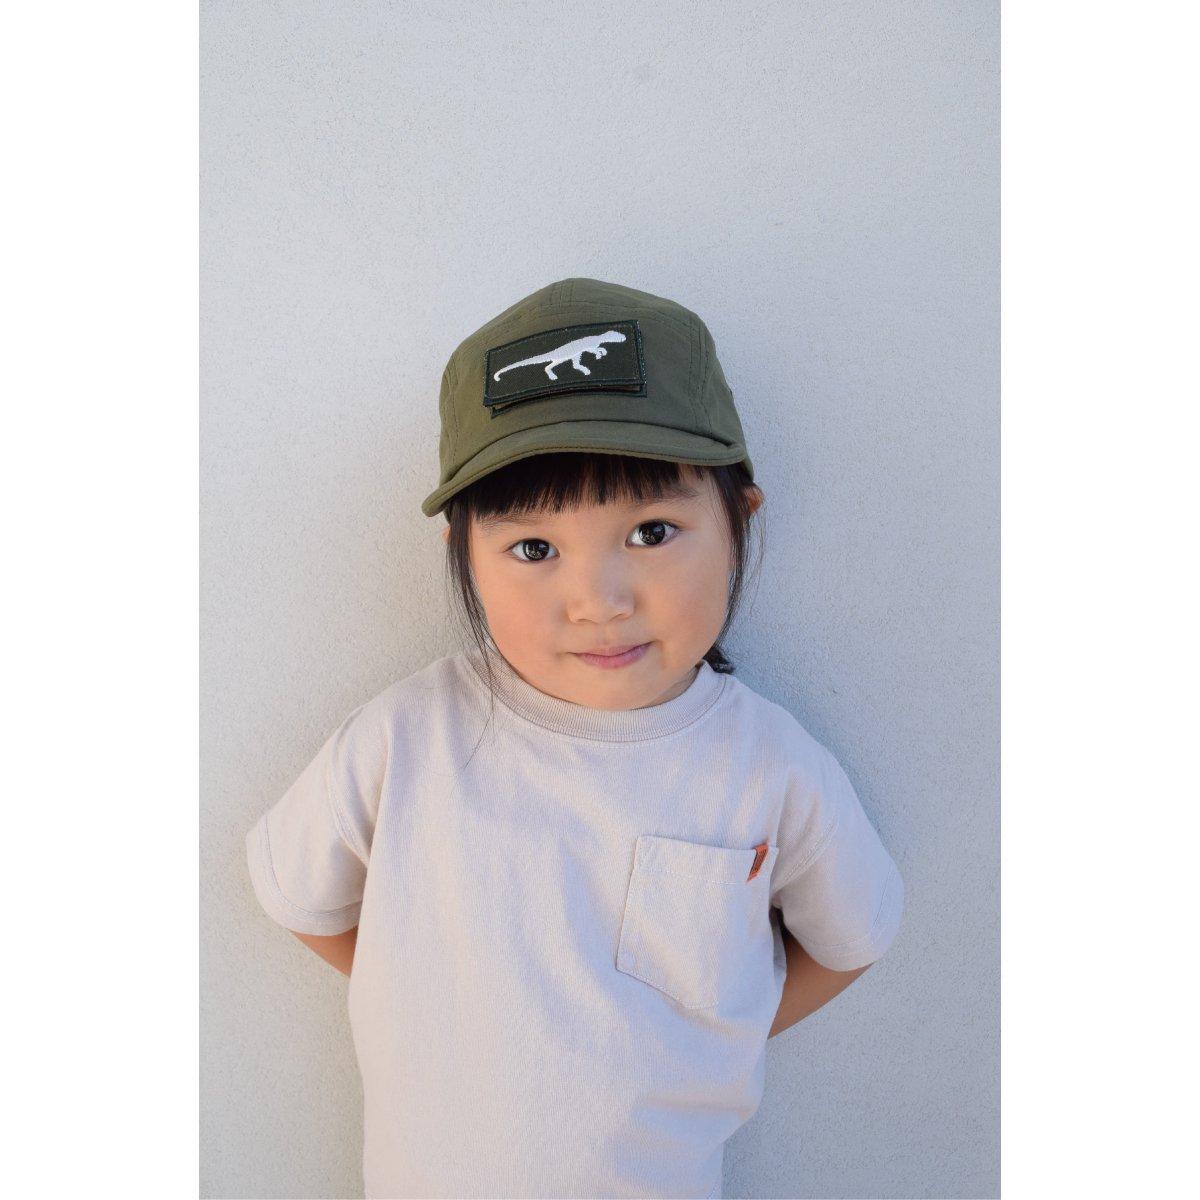 【KIDS】Dinosaur Magic Cap 詳細画像26